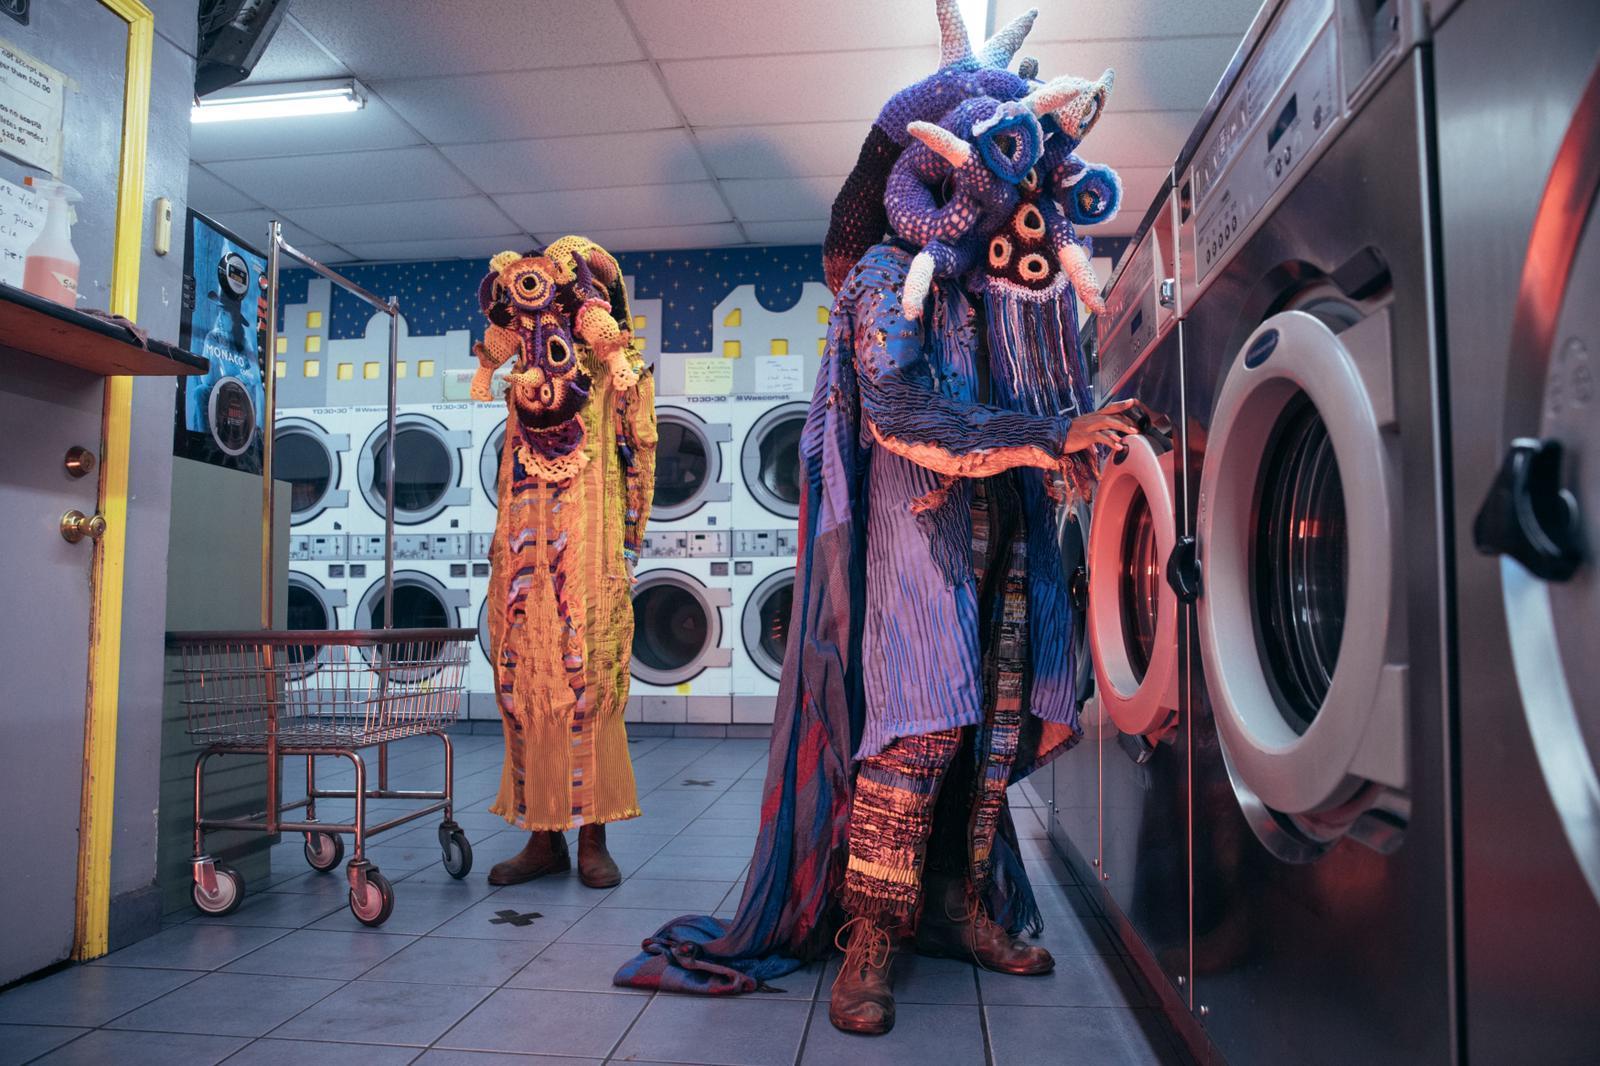 figures colorful costume laundromat